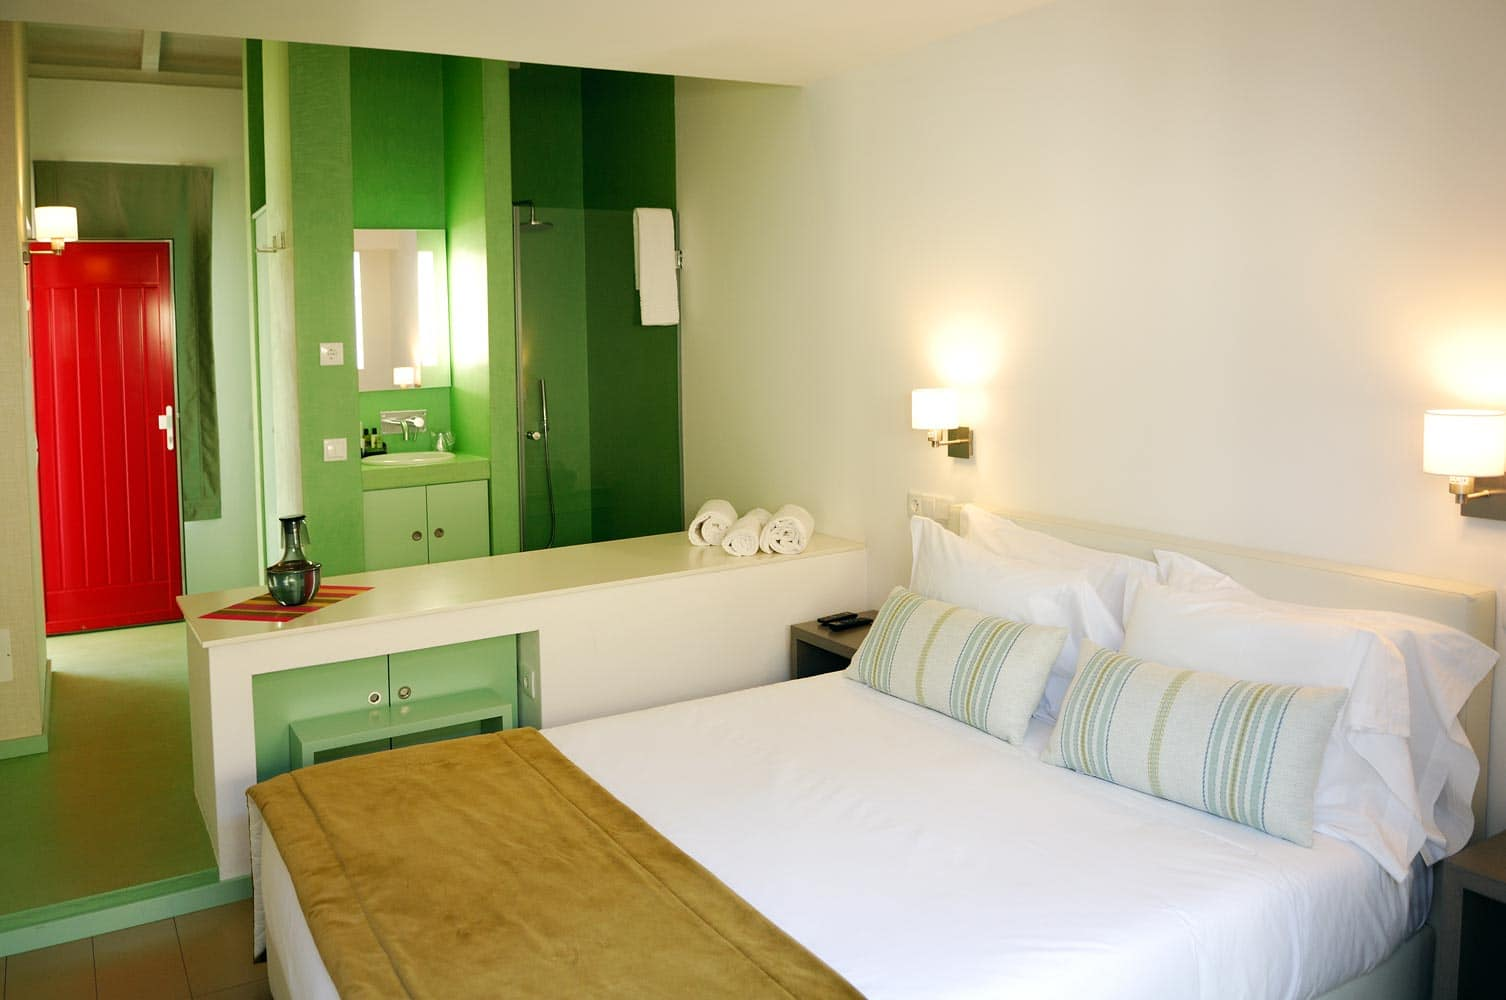 Rota Vicentina walking holiday accommodation example 3